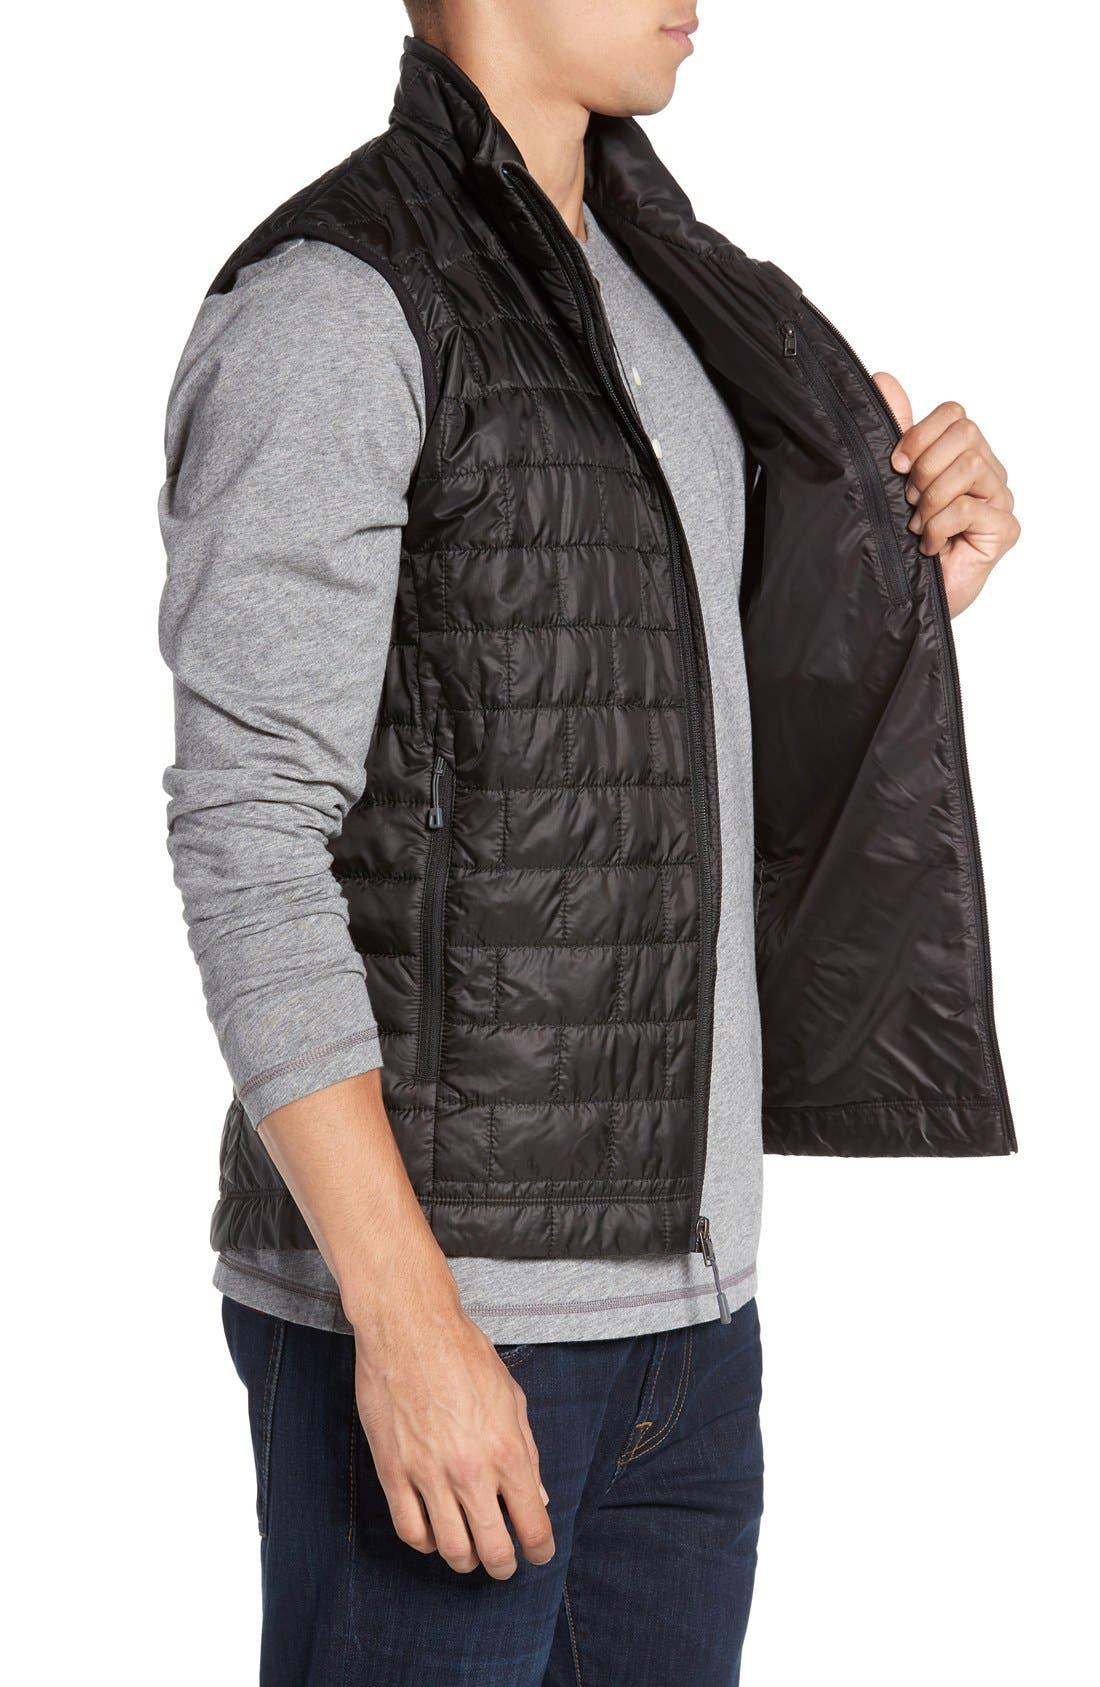 PATAGONIA, Nano Puff<sup>®</sup> Vest, Alternate thumbnail 2, color, BLACK